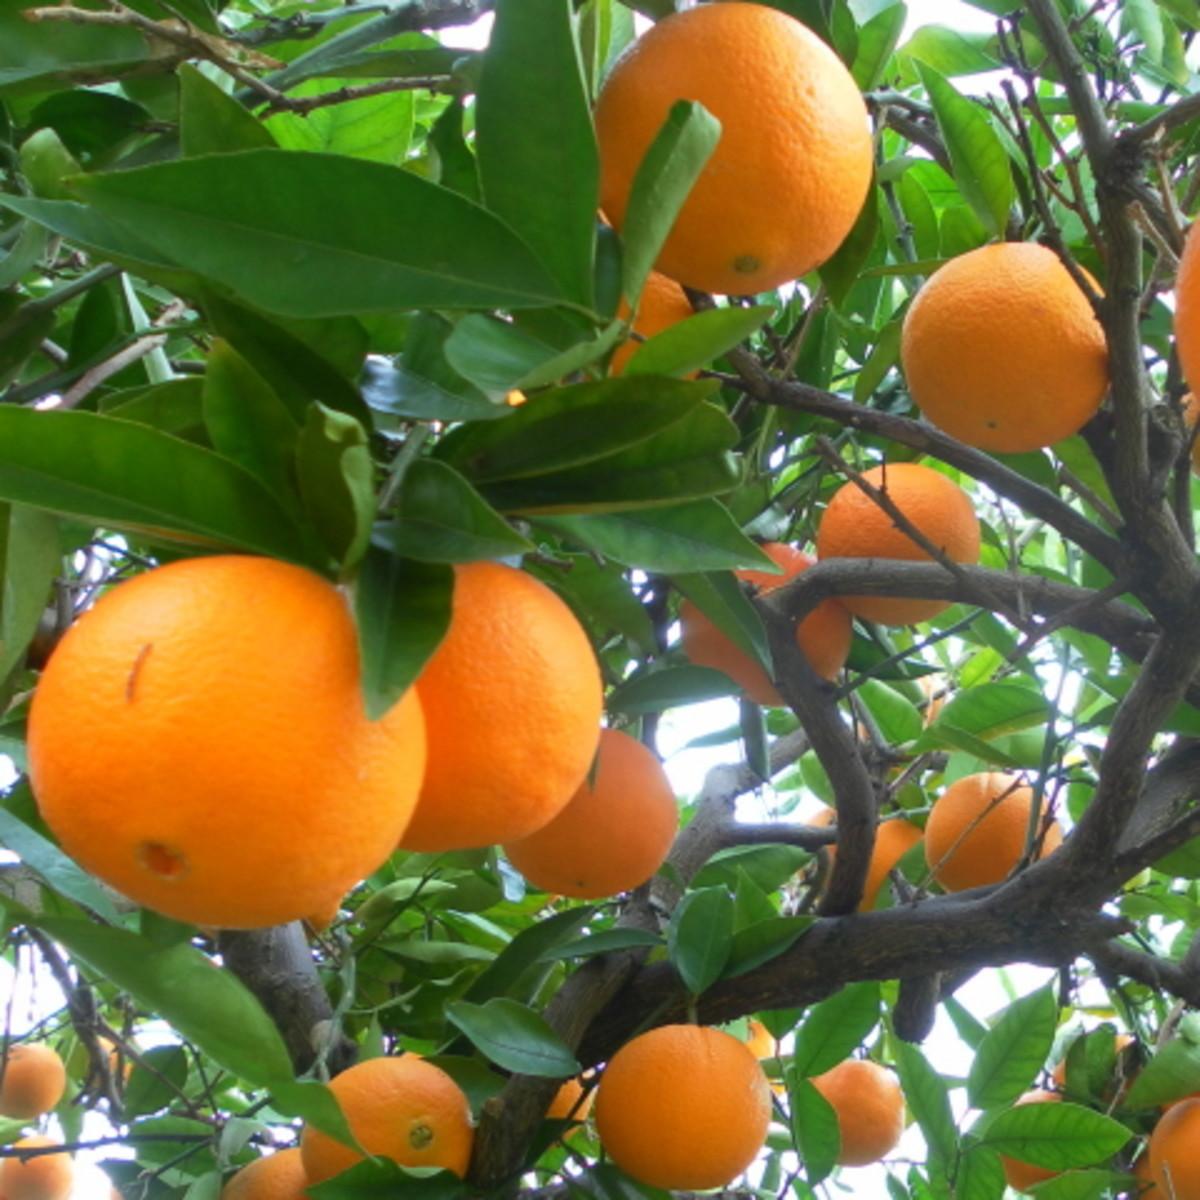 Oranges - With Recipe for Making Homemade Navel Orange Jam or Marmalade